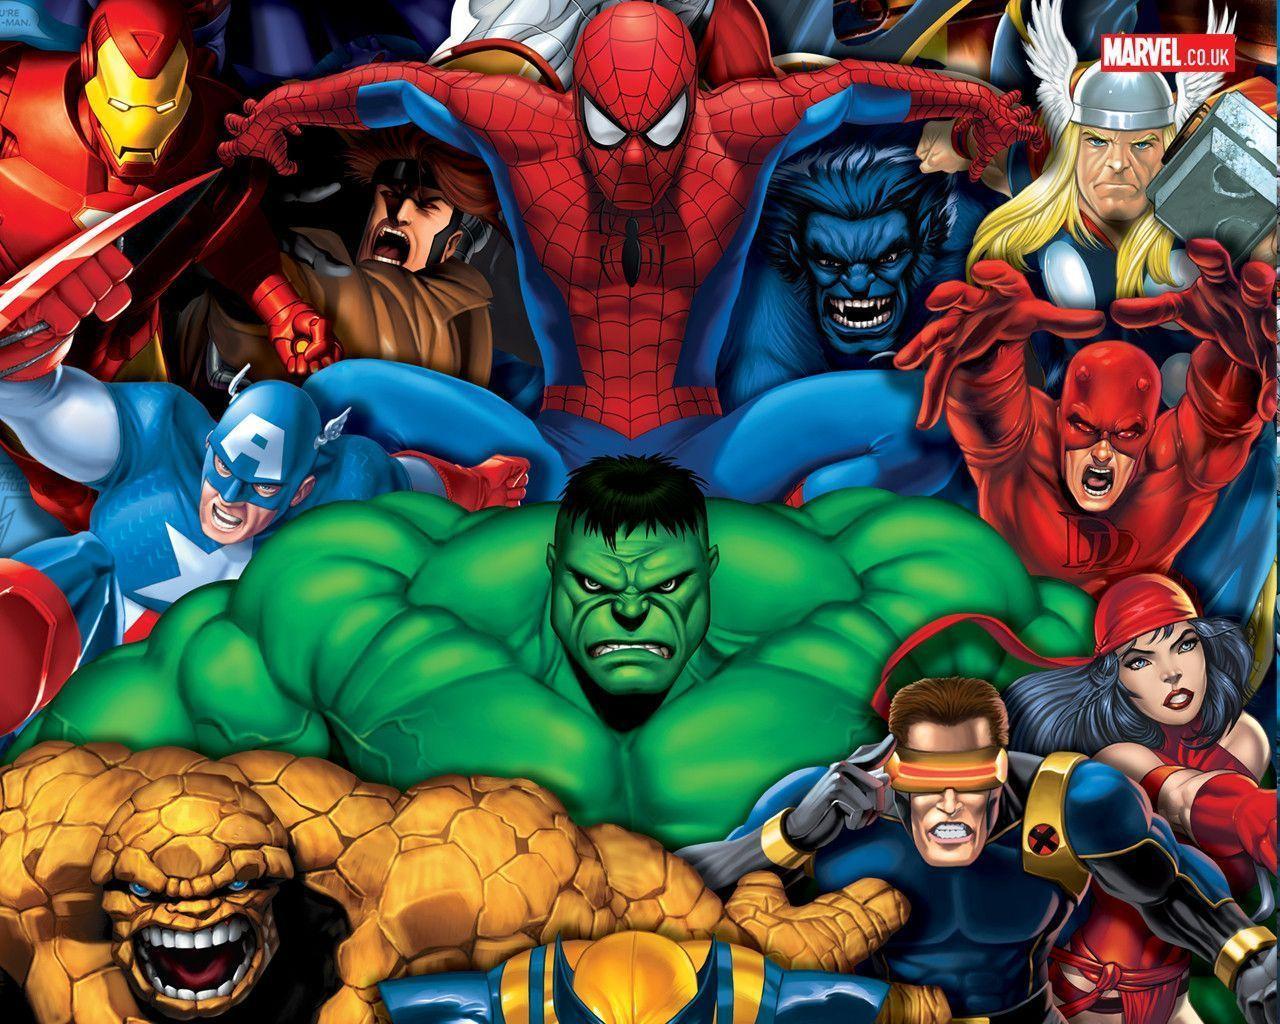 marvel comics wallpaper – 1280×1024 High Definition Wallpaper ...